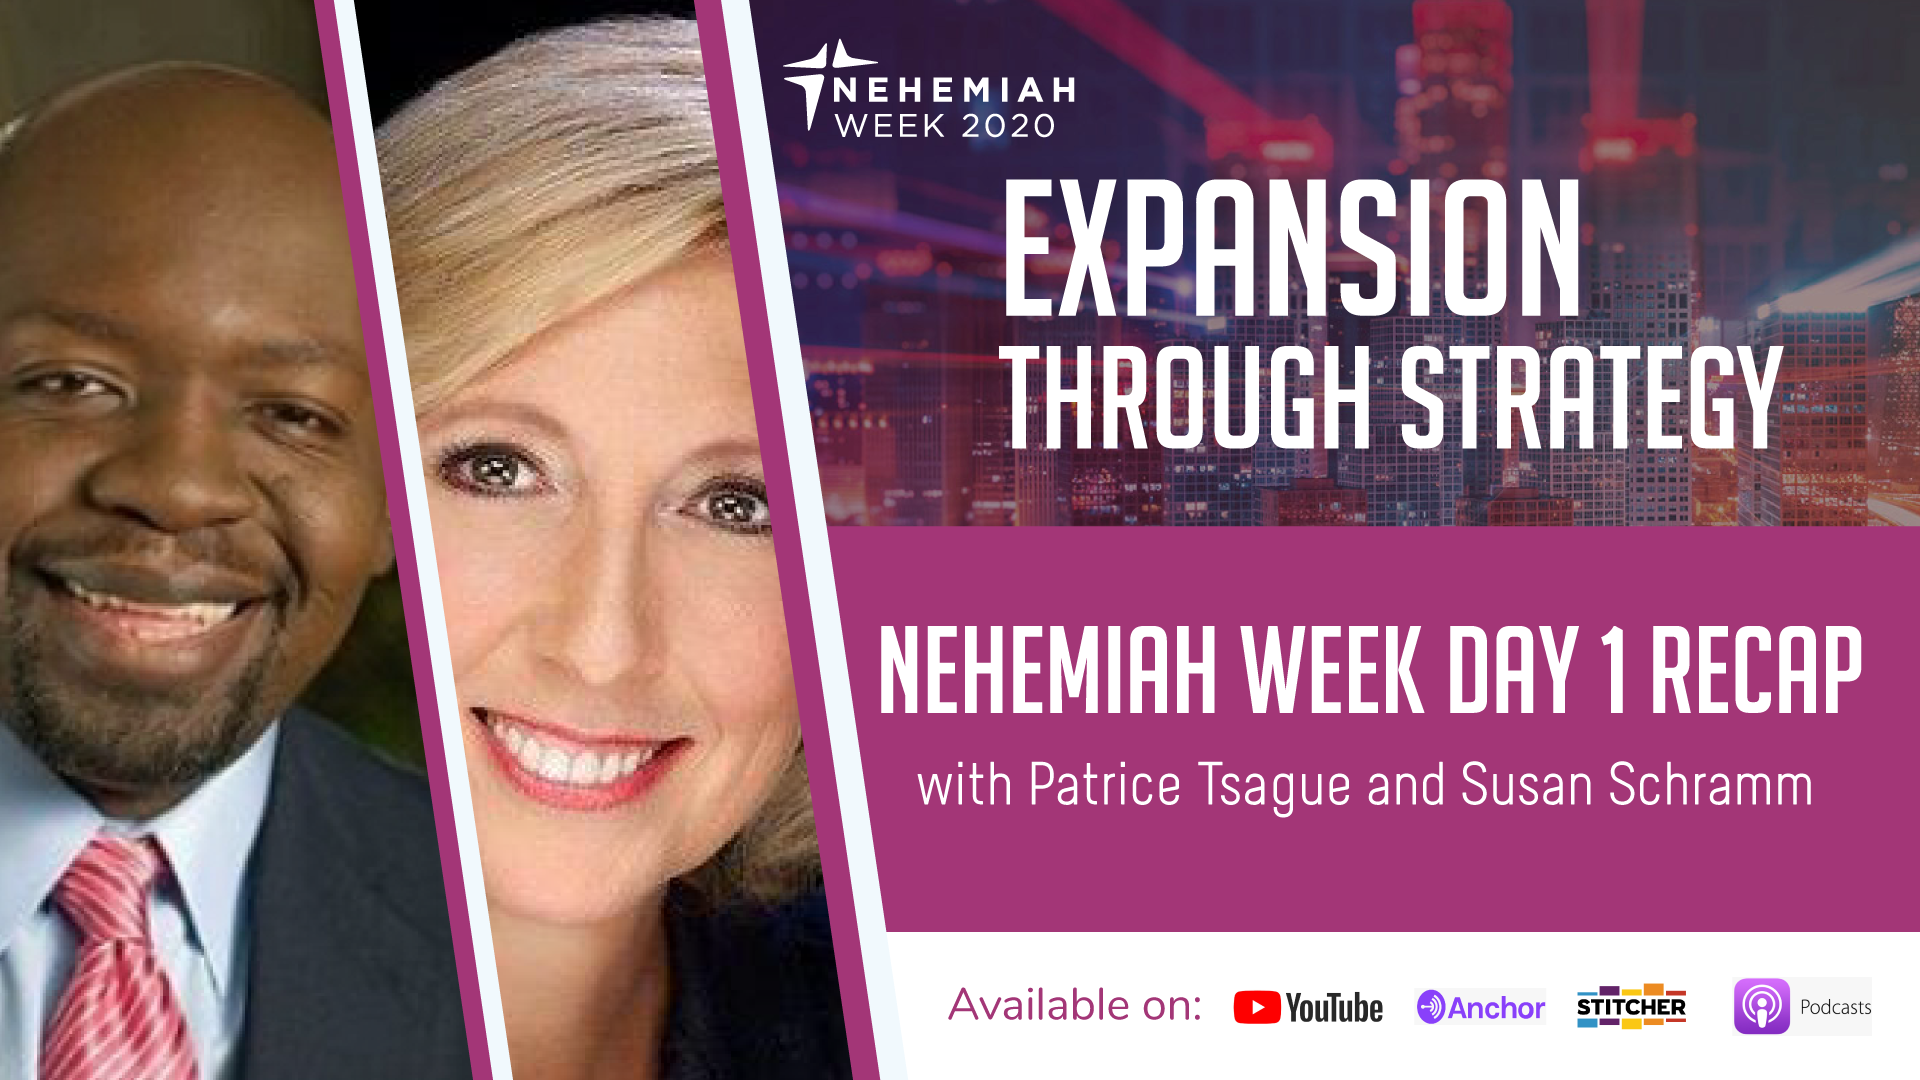 Nehemiah Week Day 1 Recap